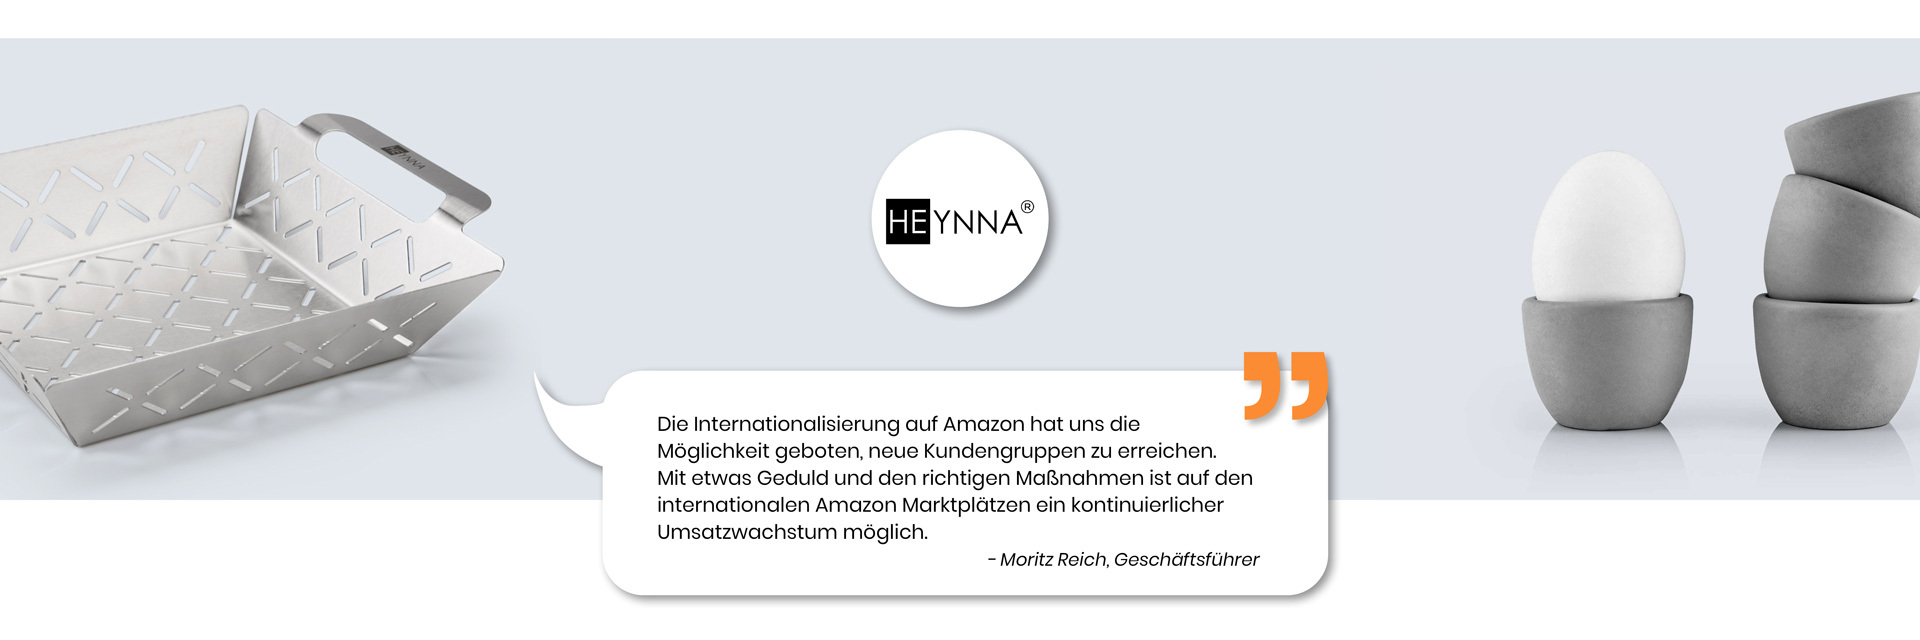 Amazon International - Kundenstimme Heynna